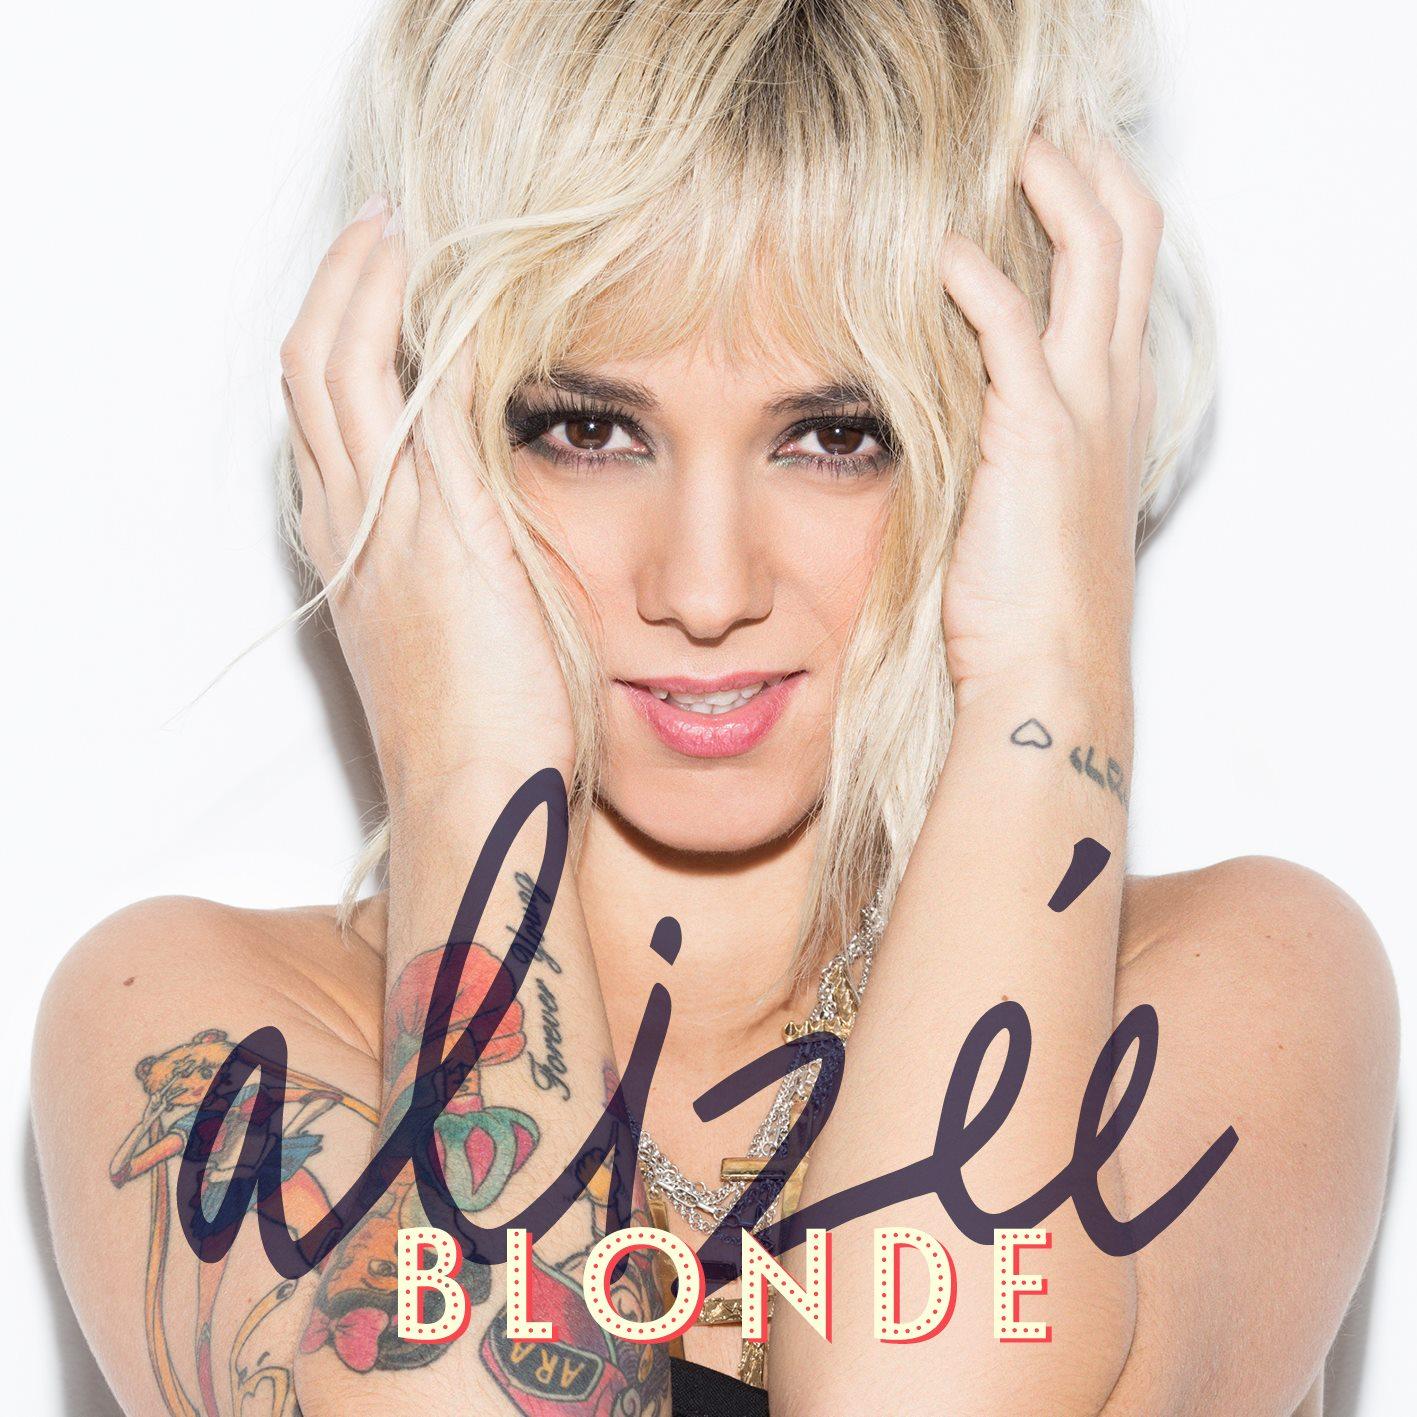 Alizee-Blonde